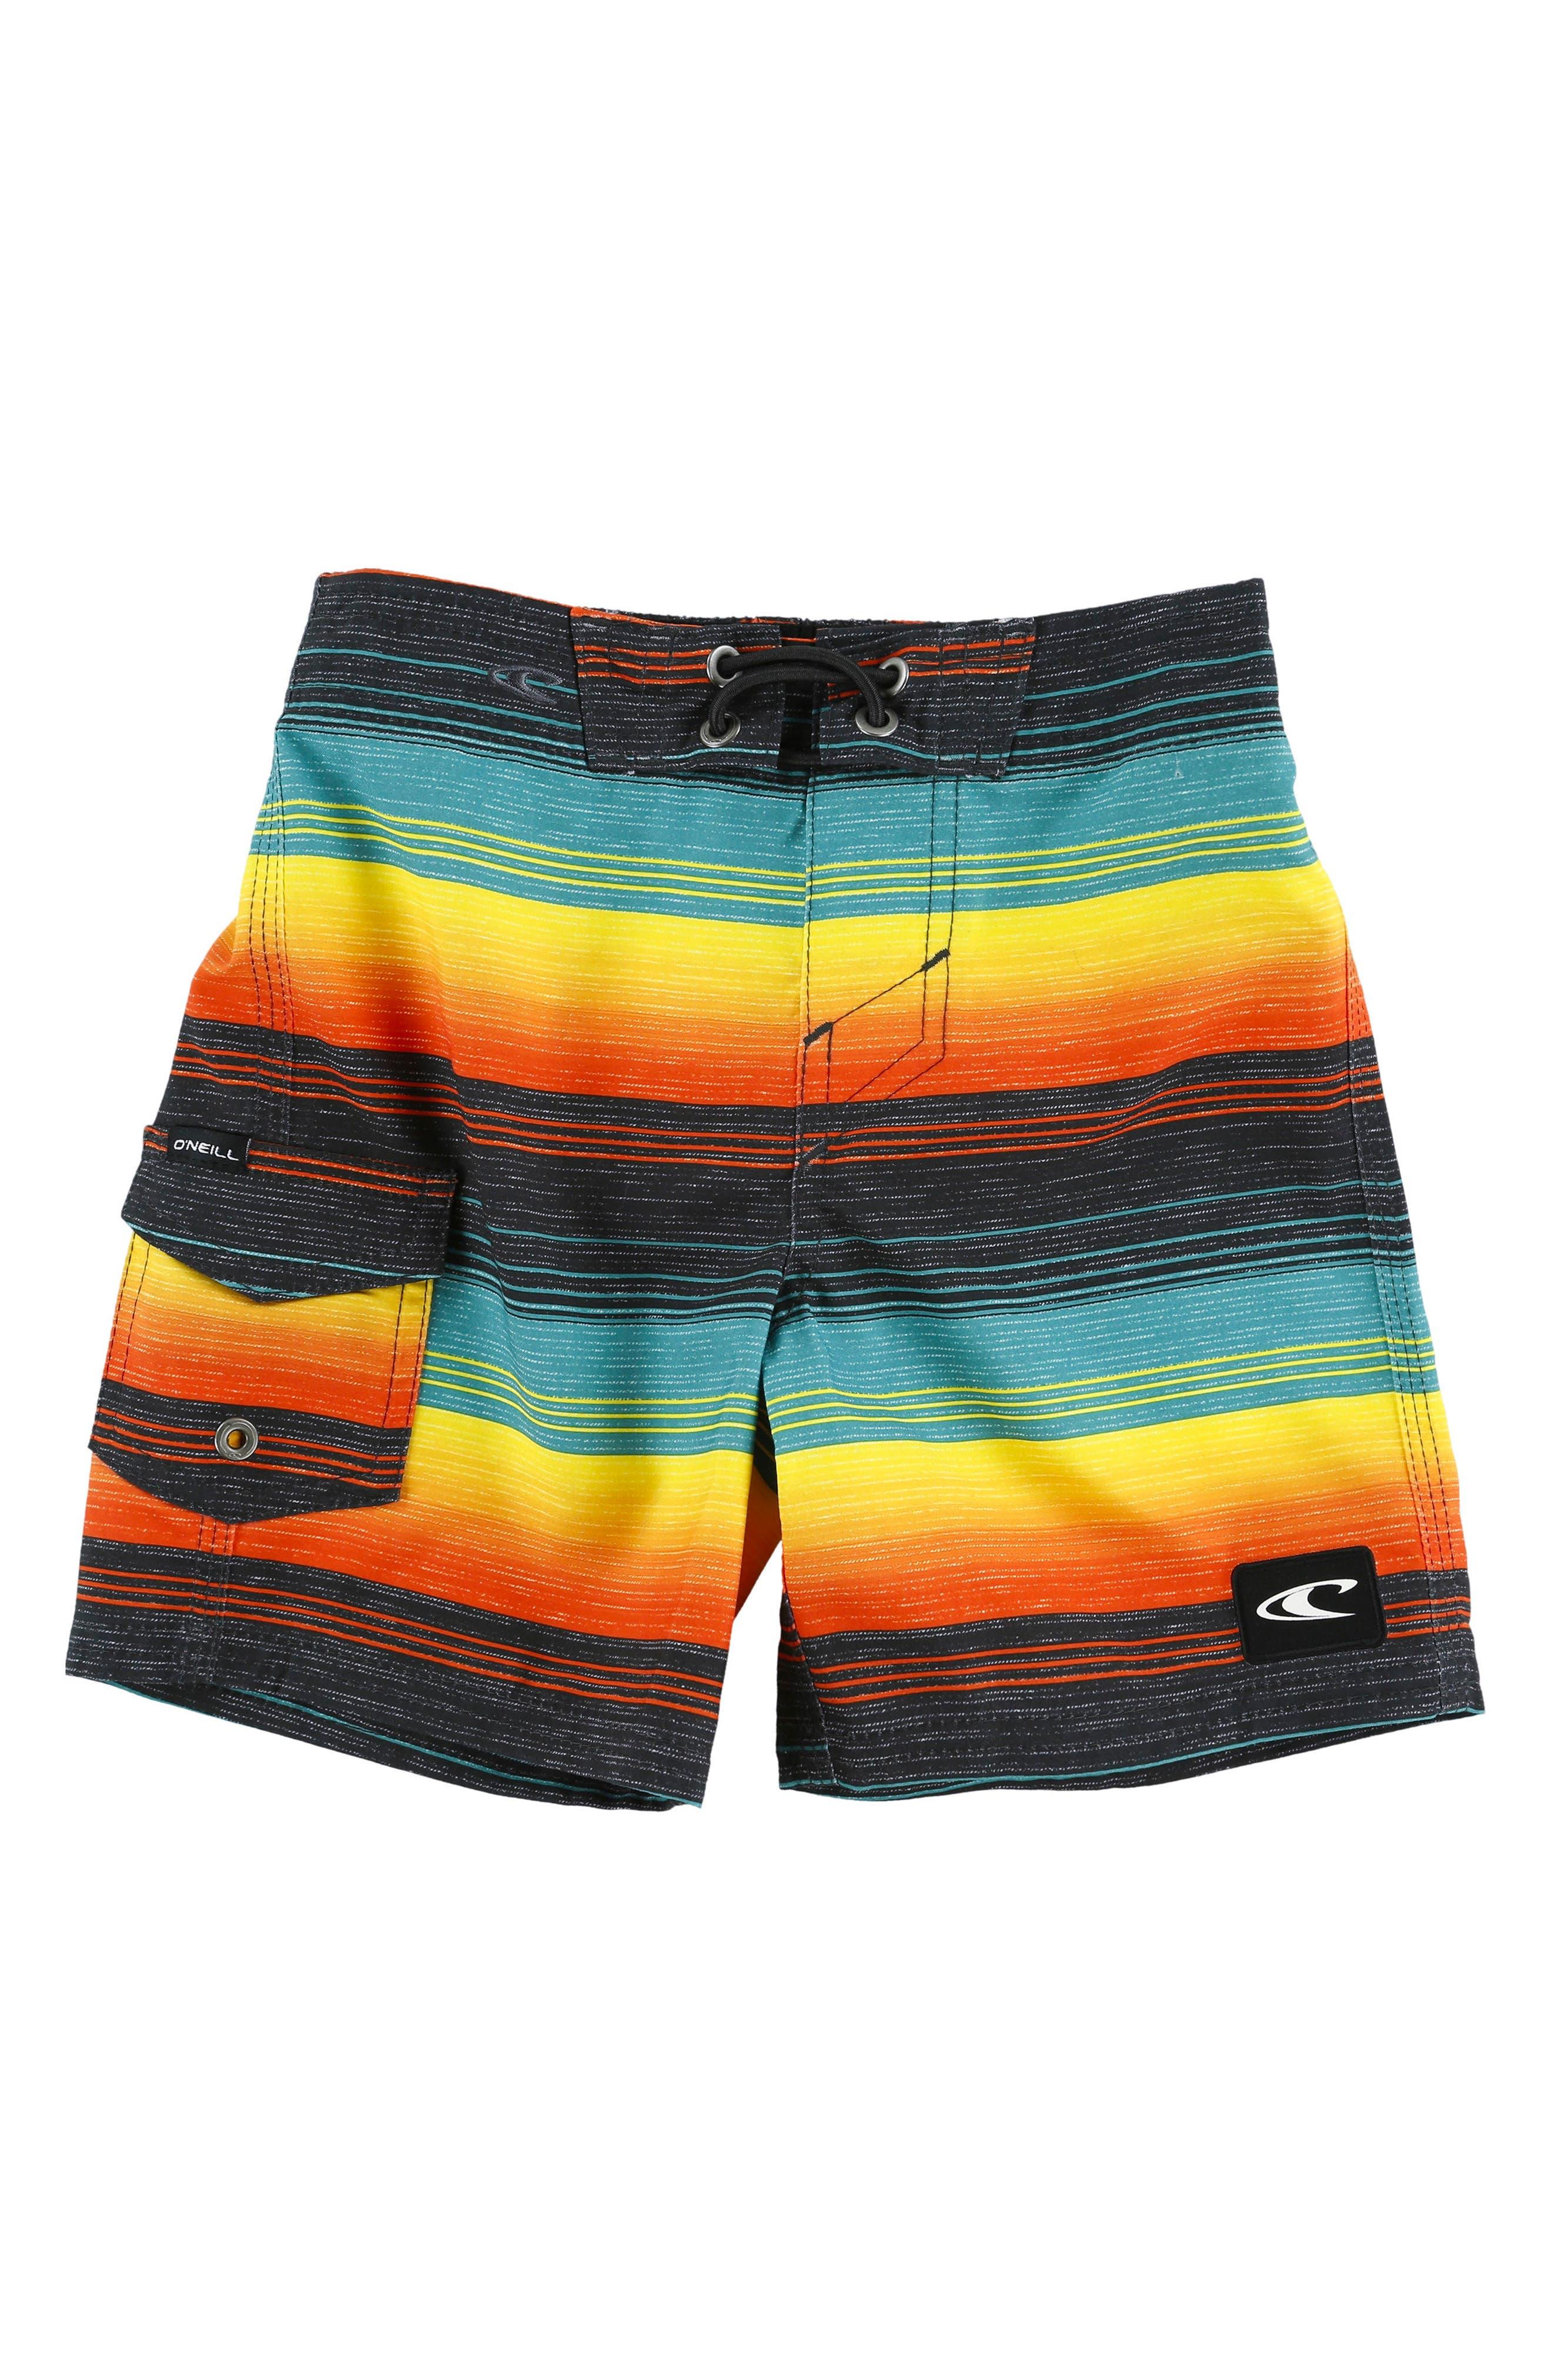 Santa Cruz Stripe Board Shorts,                             Main thumbnail 1, color,                             Multi